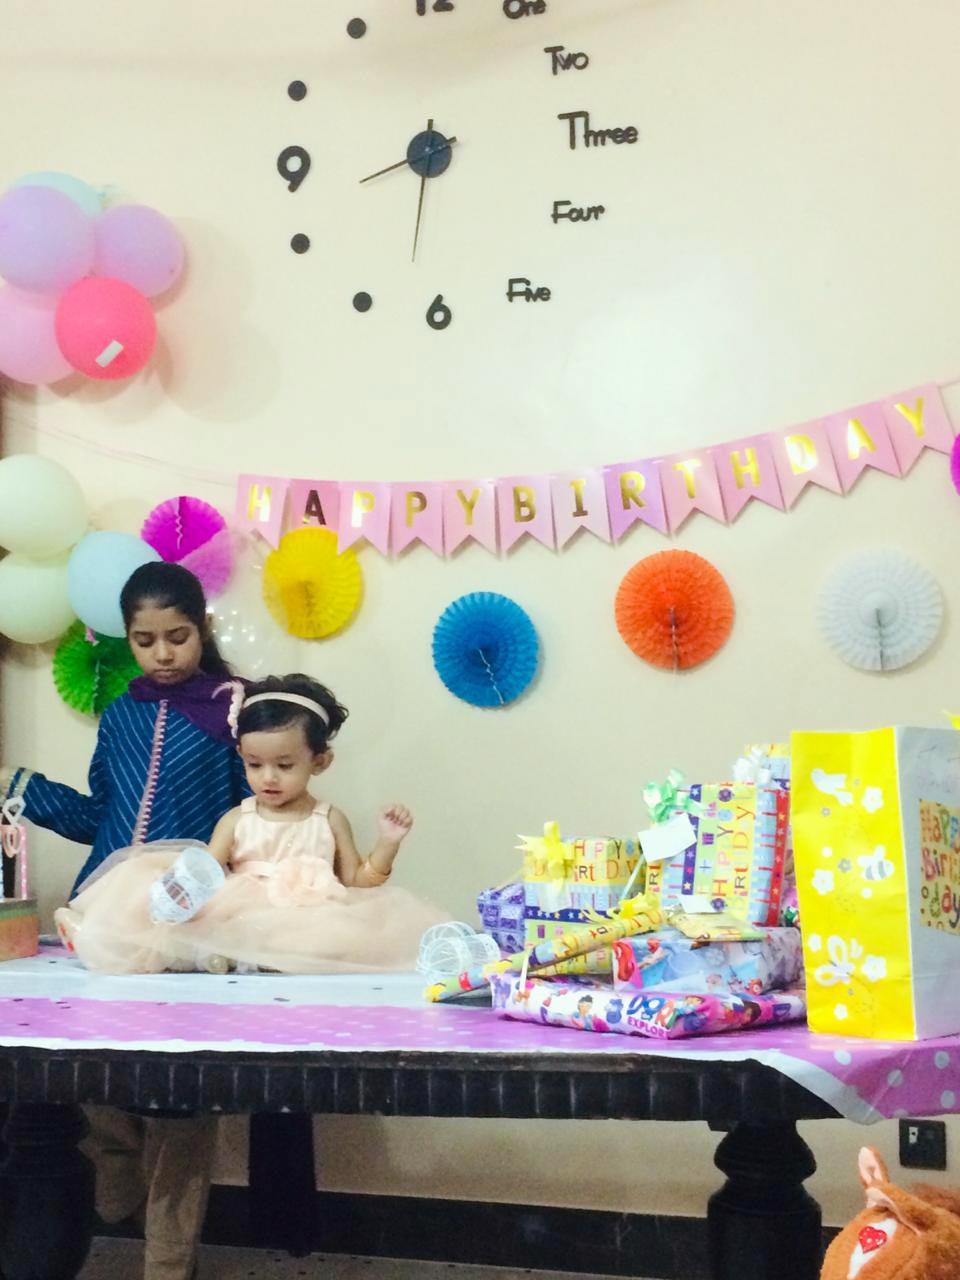 Zara Imran and Baby Ayra playing and enjoying together.